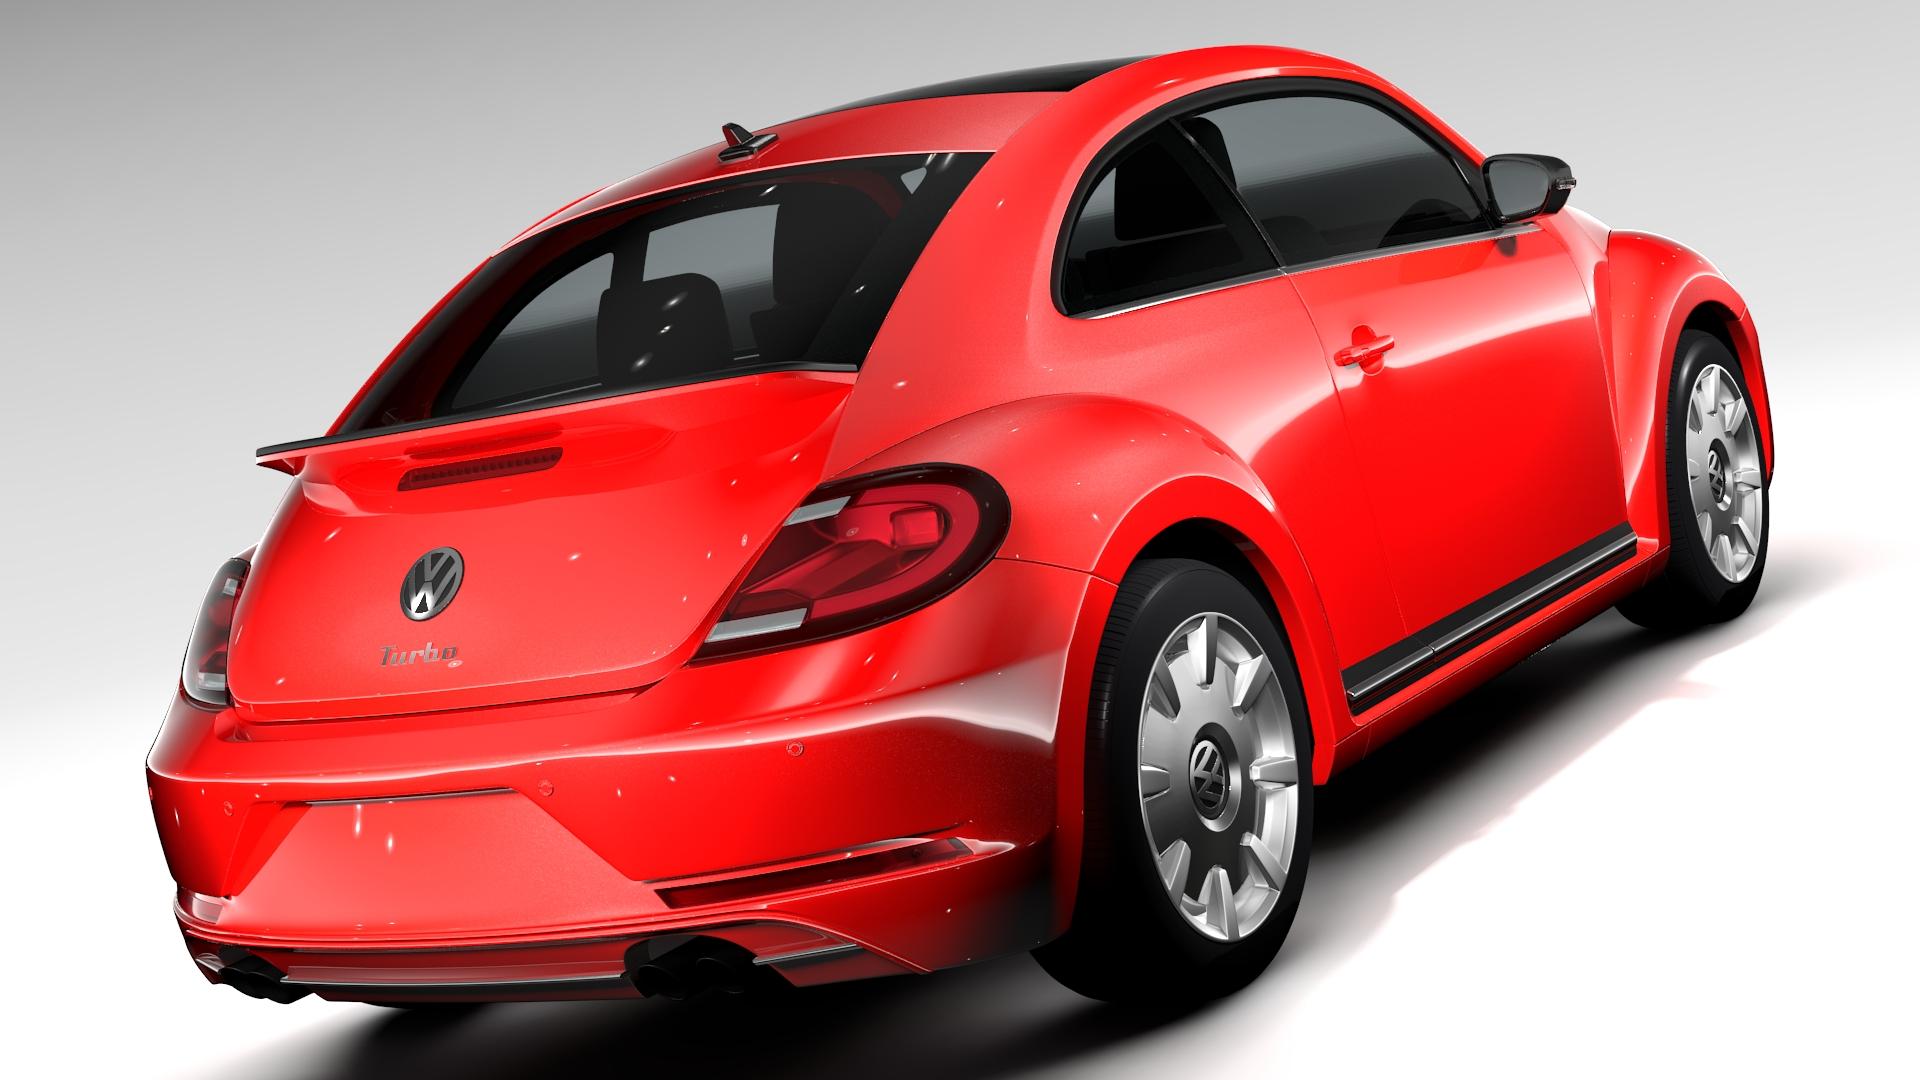 vw beetle turbo 2017 3d model 3ds max fbx c4d lwo ma mb hrc xsi obj 221656